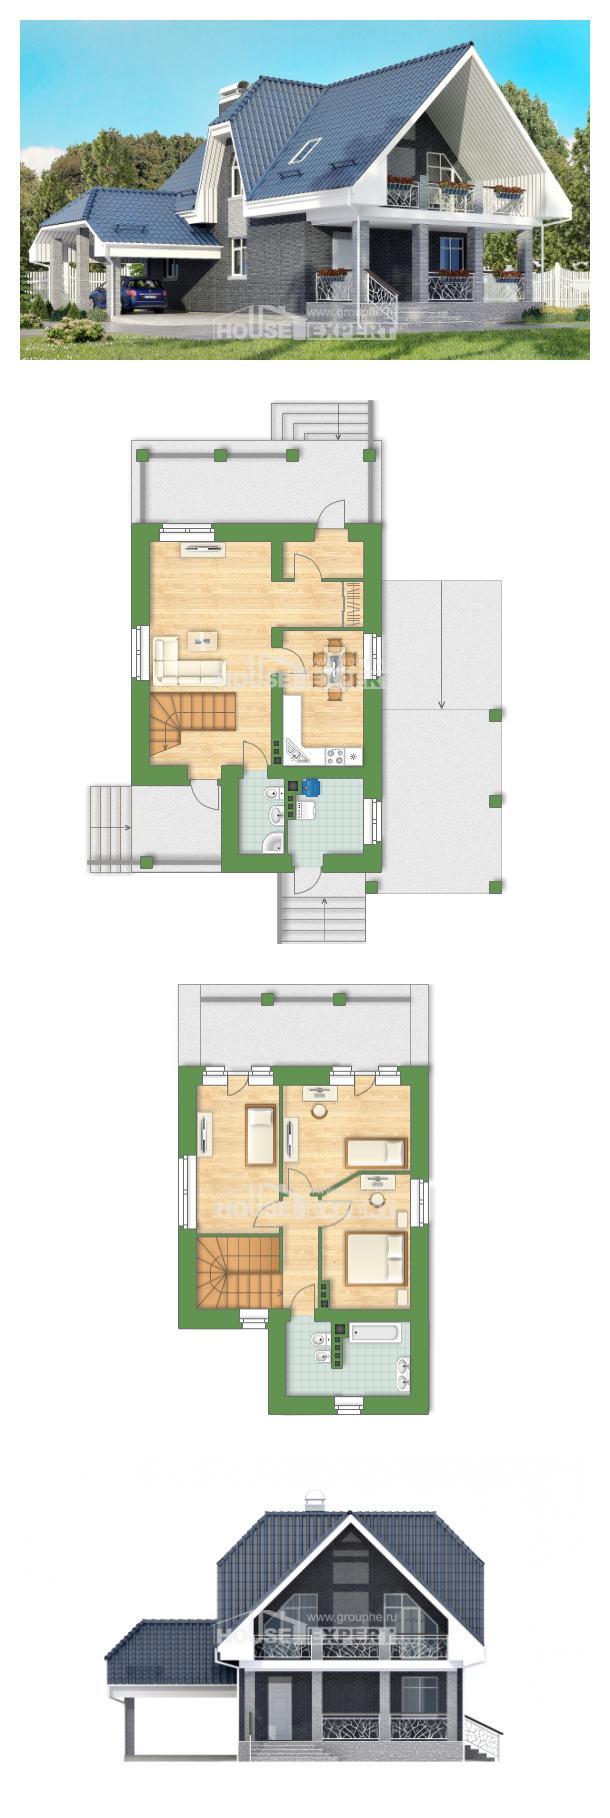 Ev villa projesi 125-002-L   House Expert